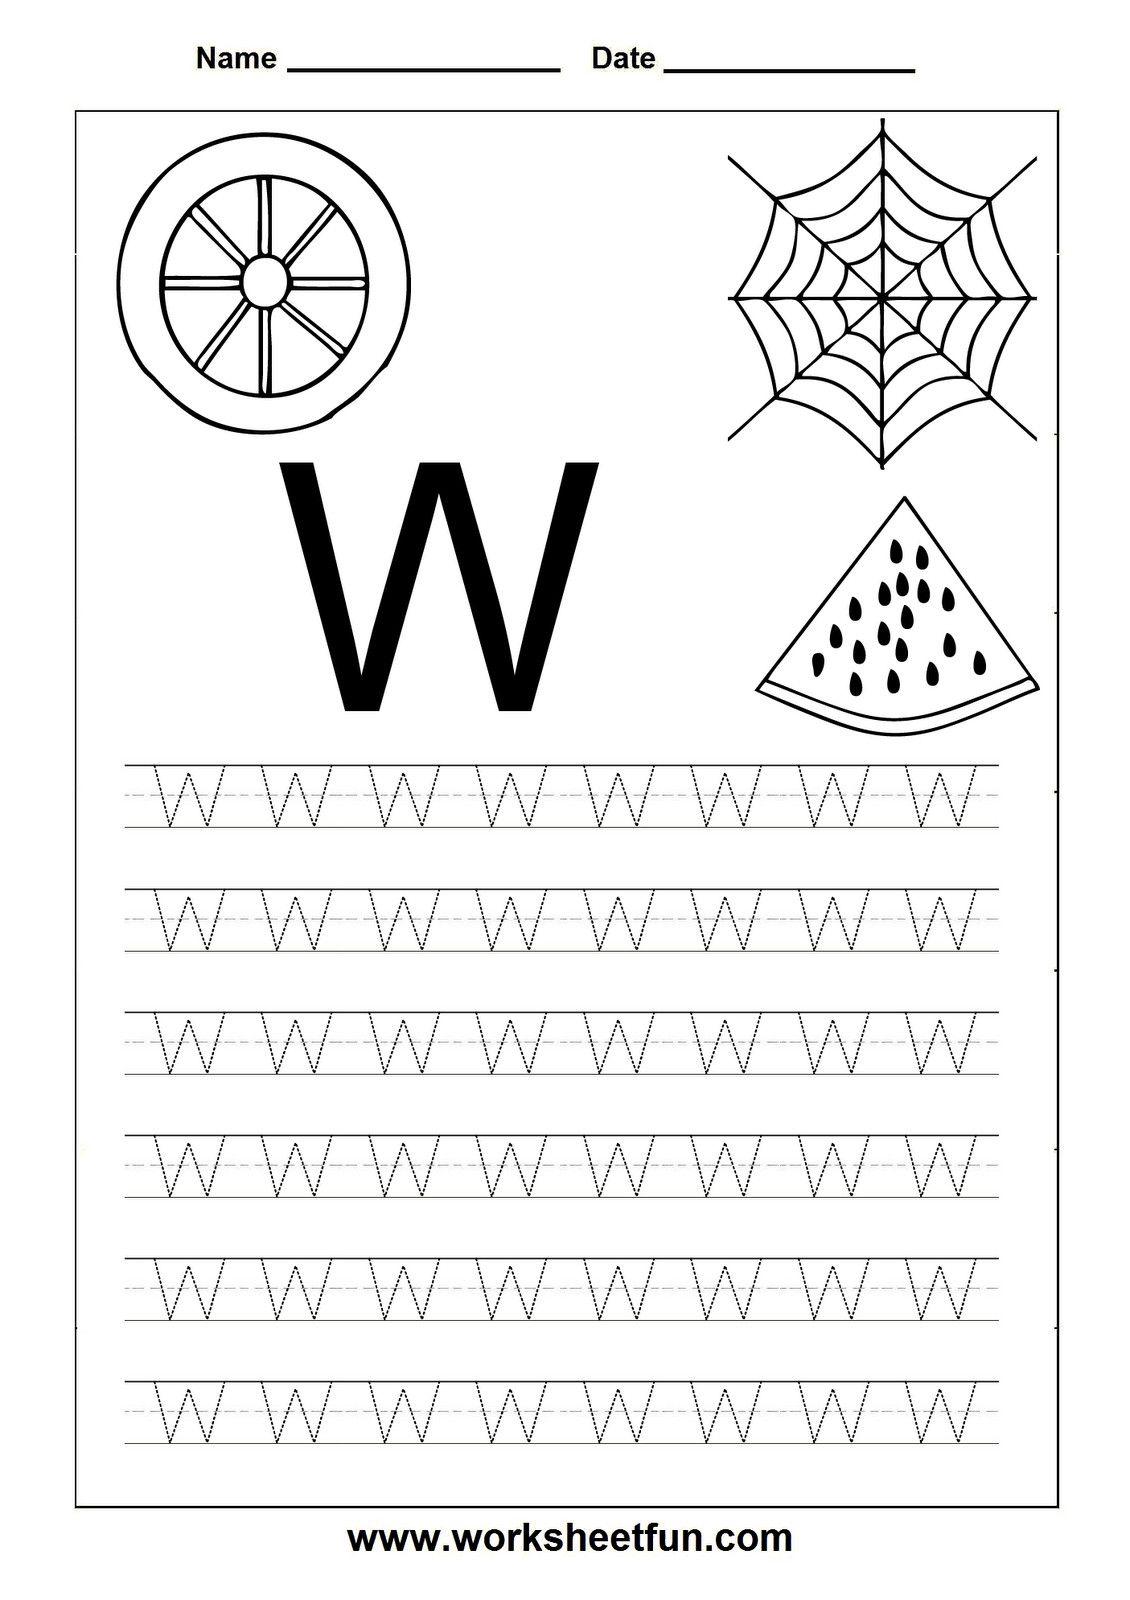 4 H Motto Printable Worksheet